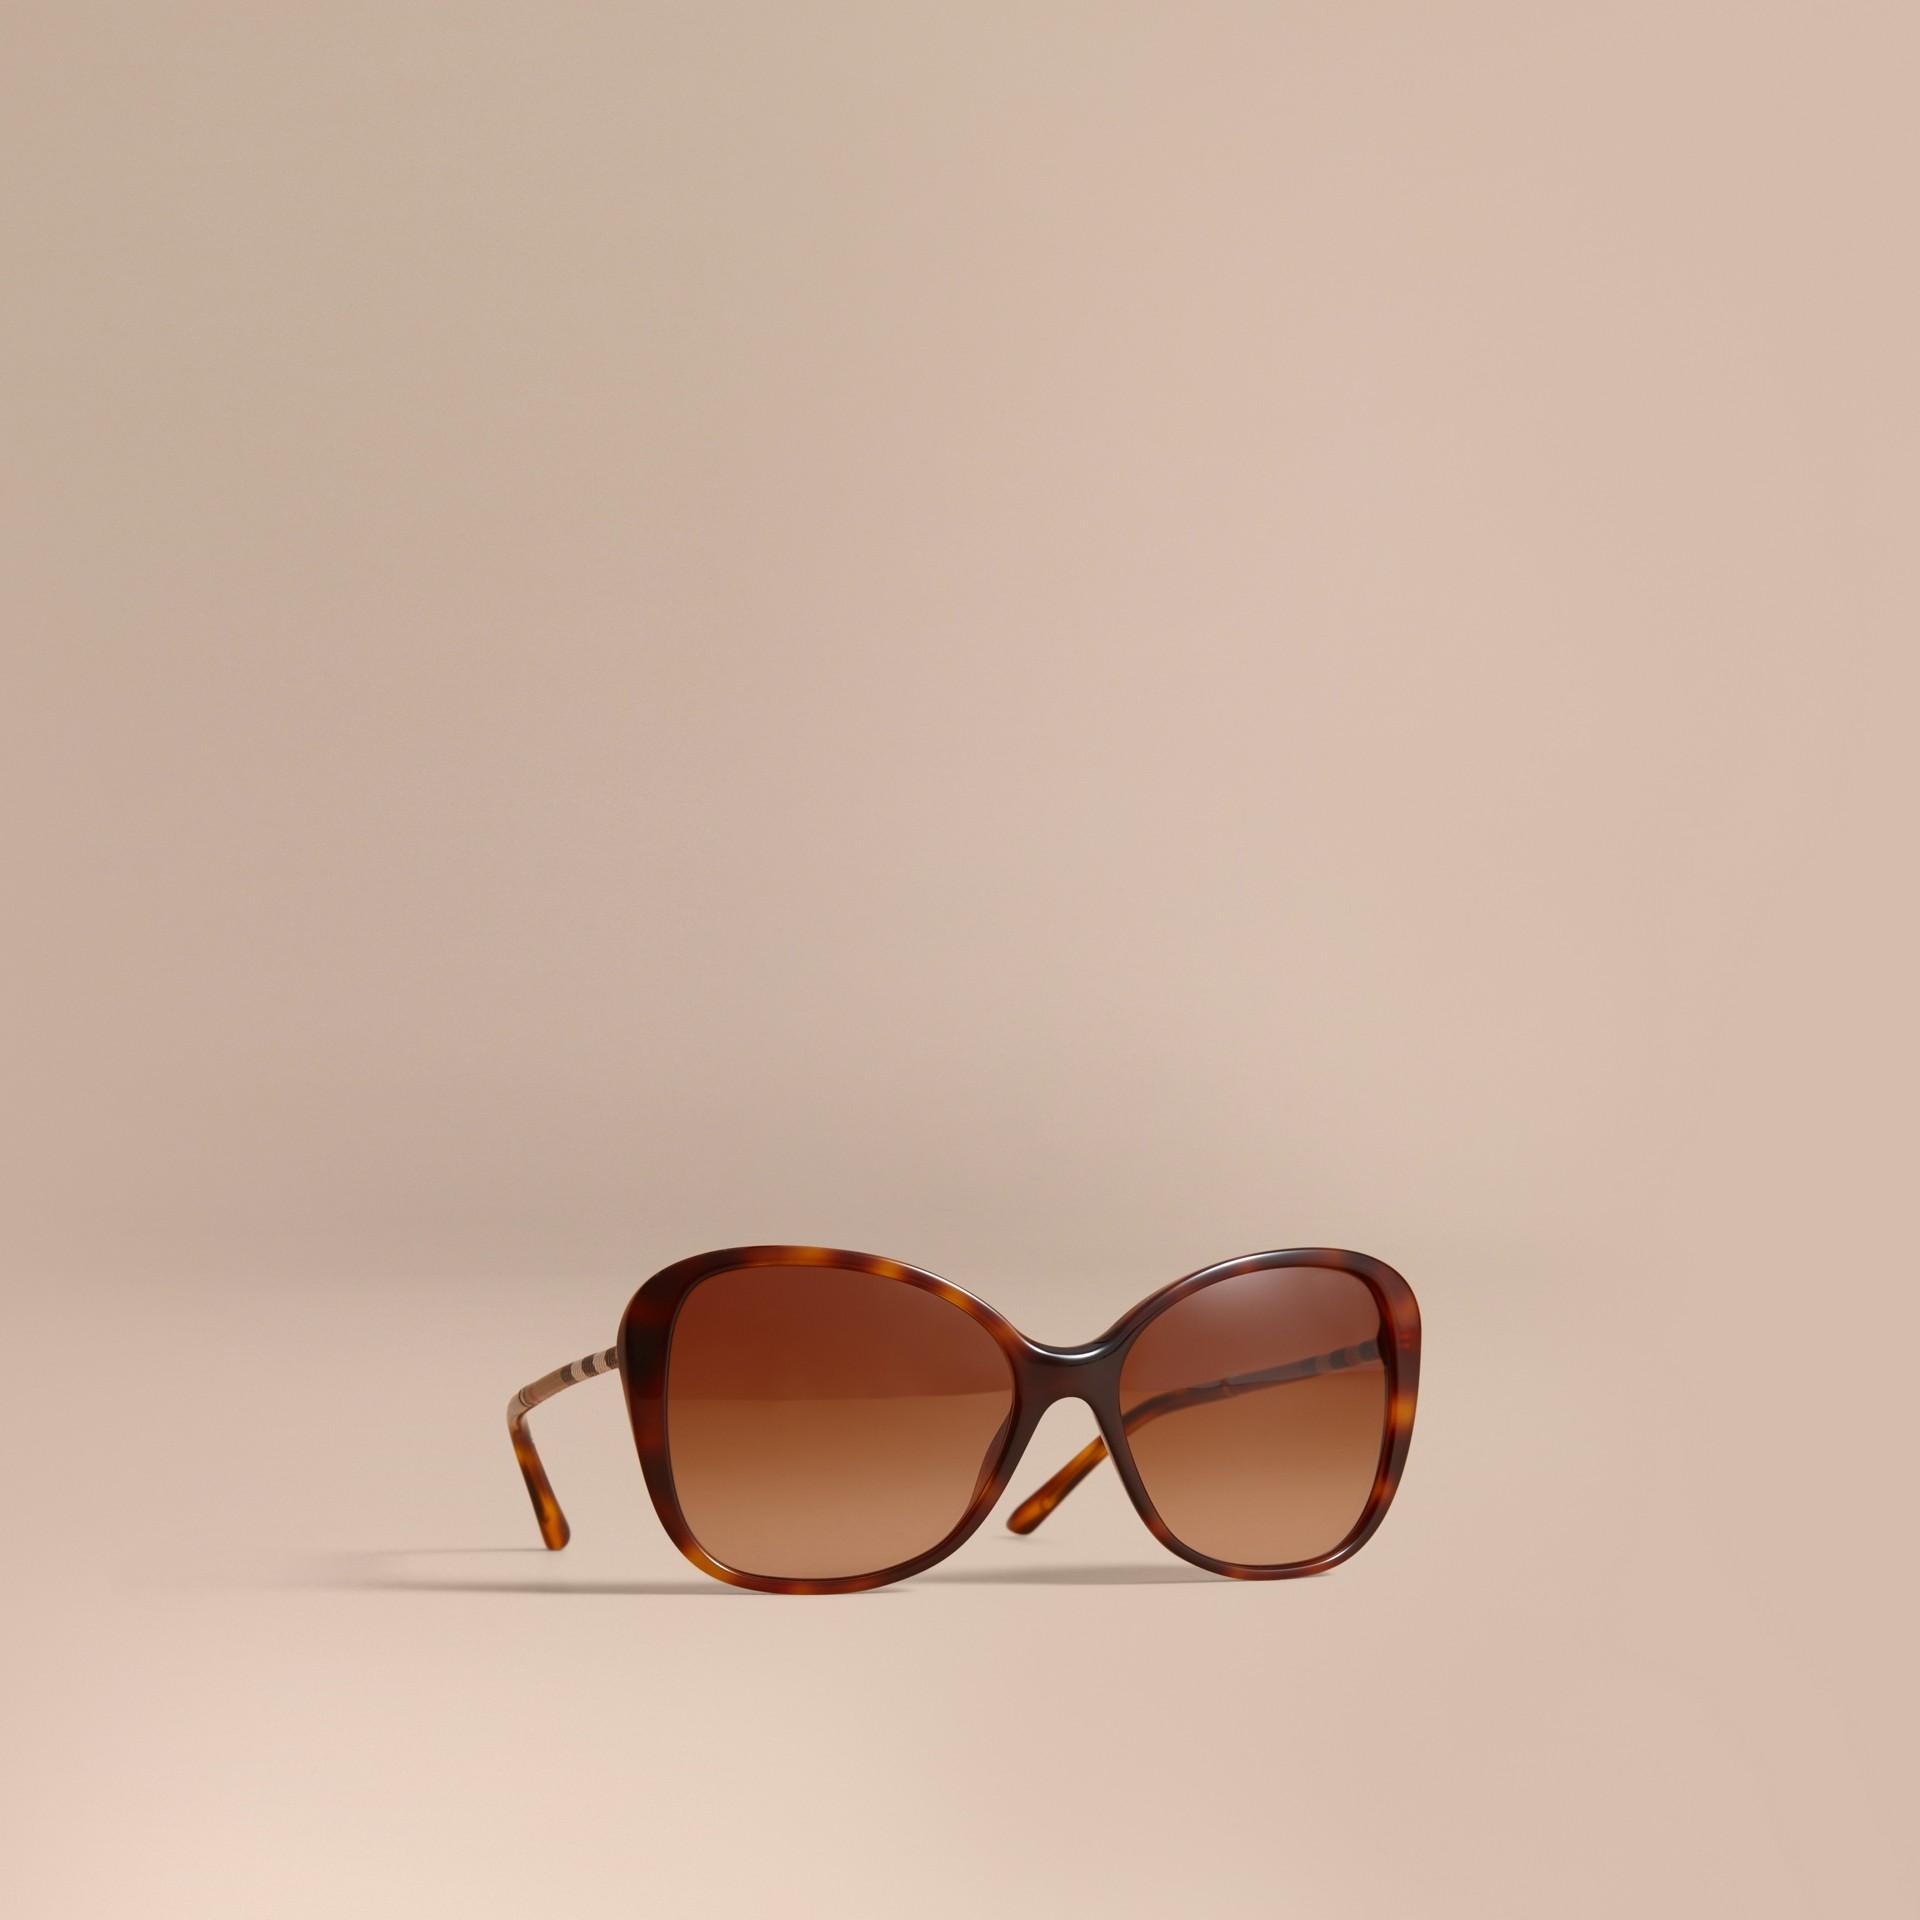 Check Detail Butterfly Frame Sunglasses Tortoiseshell - gallery image 1